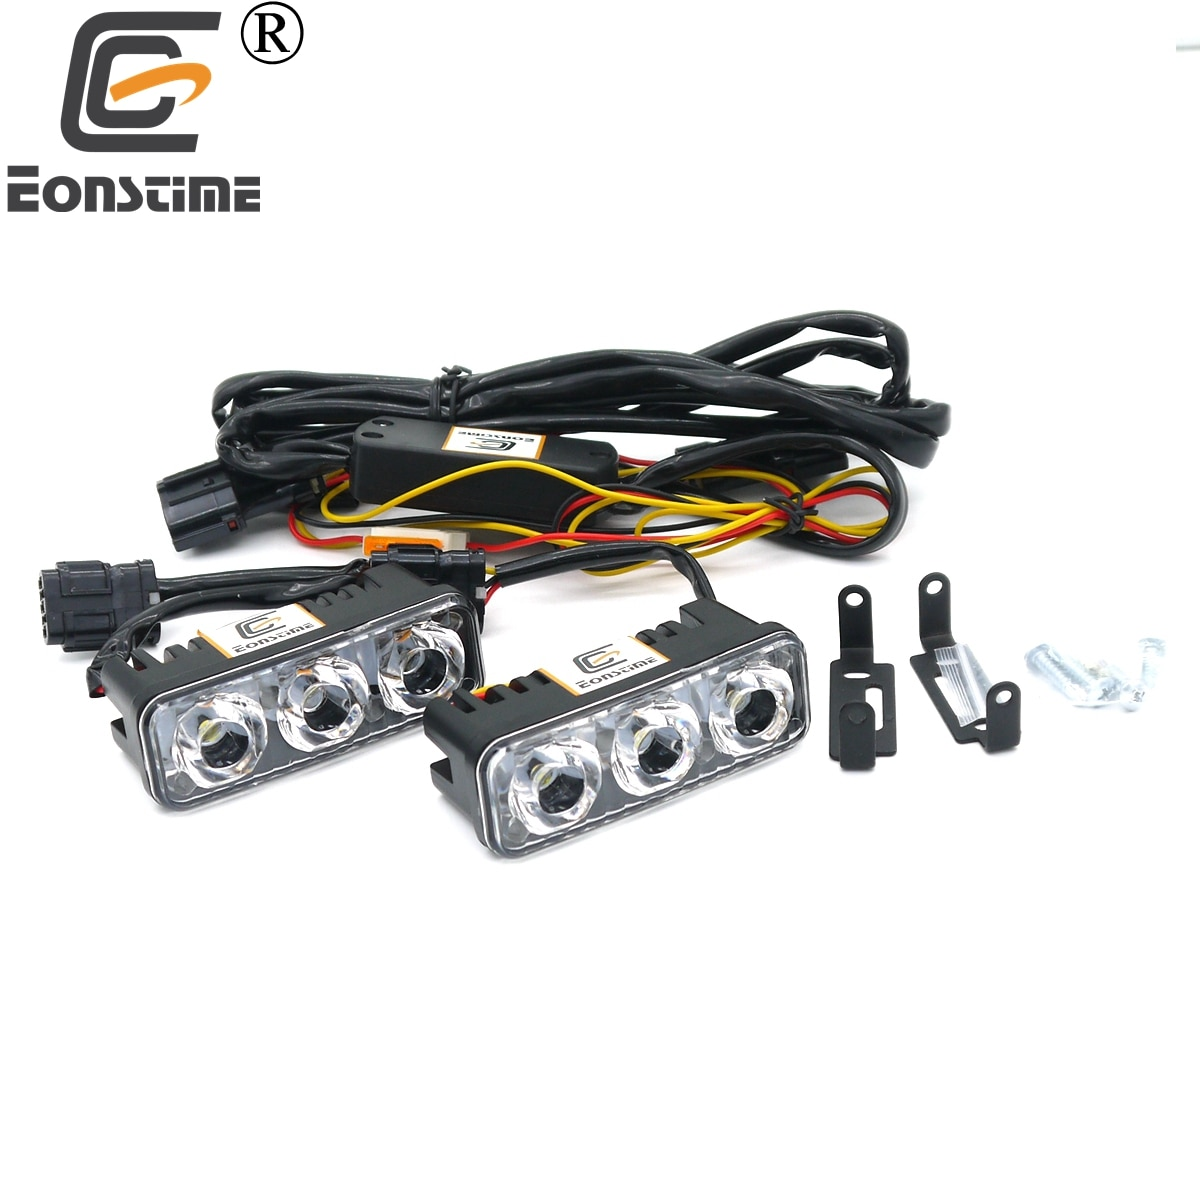 Eonstime DC12V/24V Waterproof Car Auto High Power Aluminum LED Daytime Running Lights with Lens 6000K DRL Fog Lamps Turn Signal